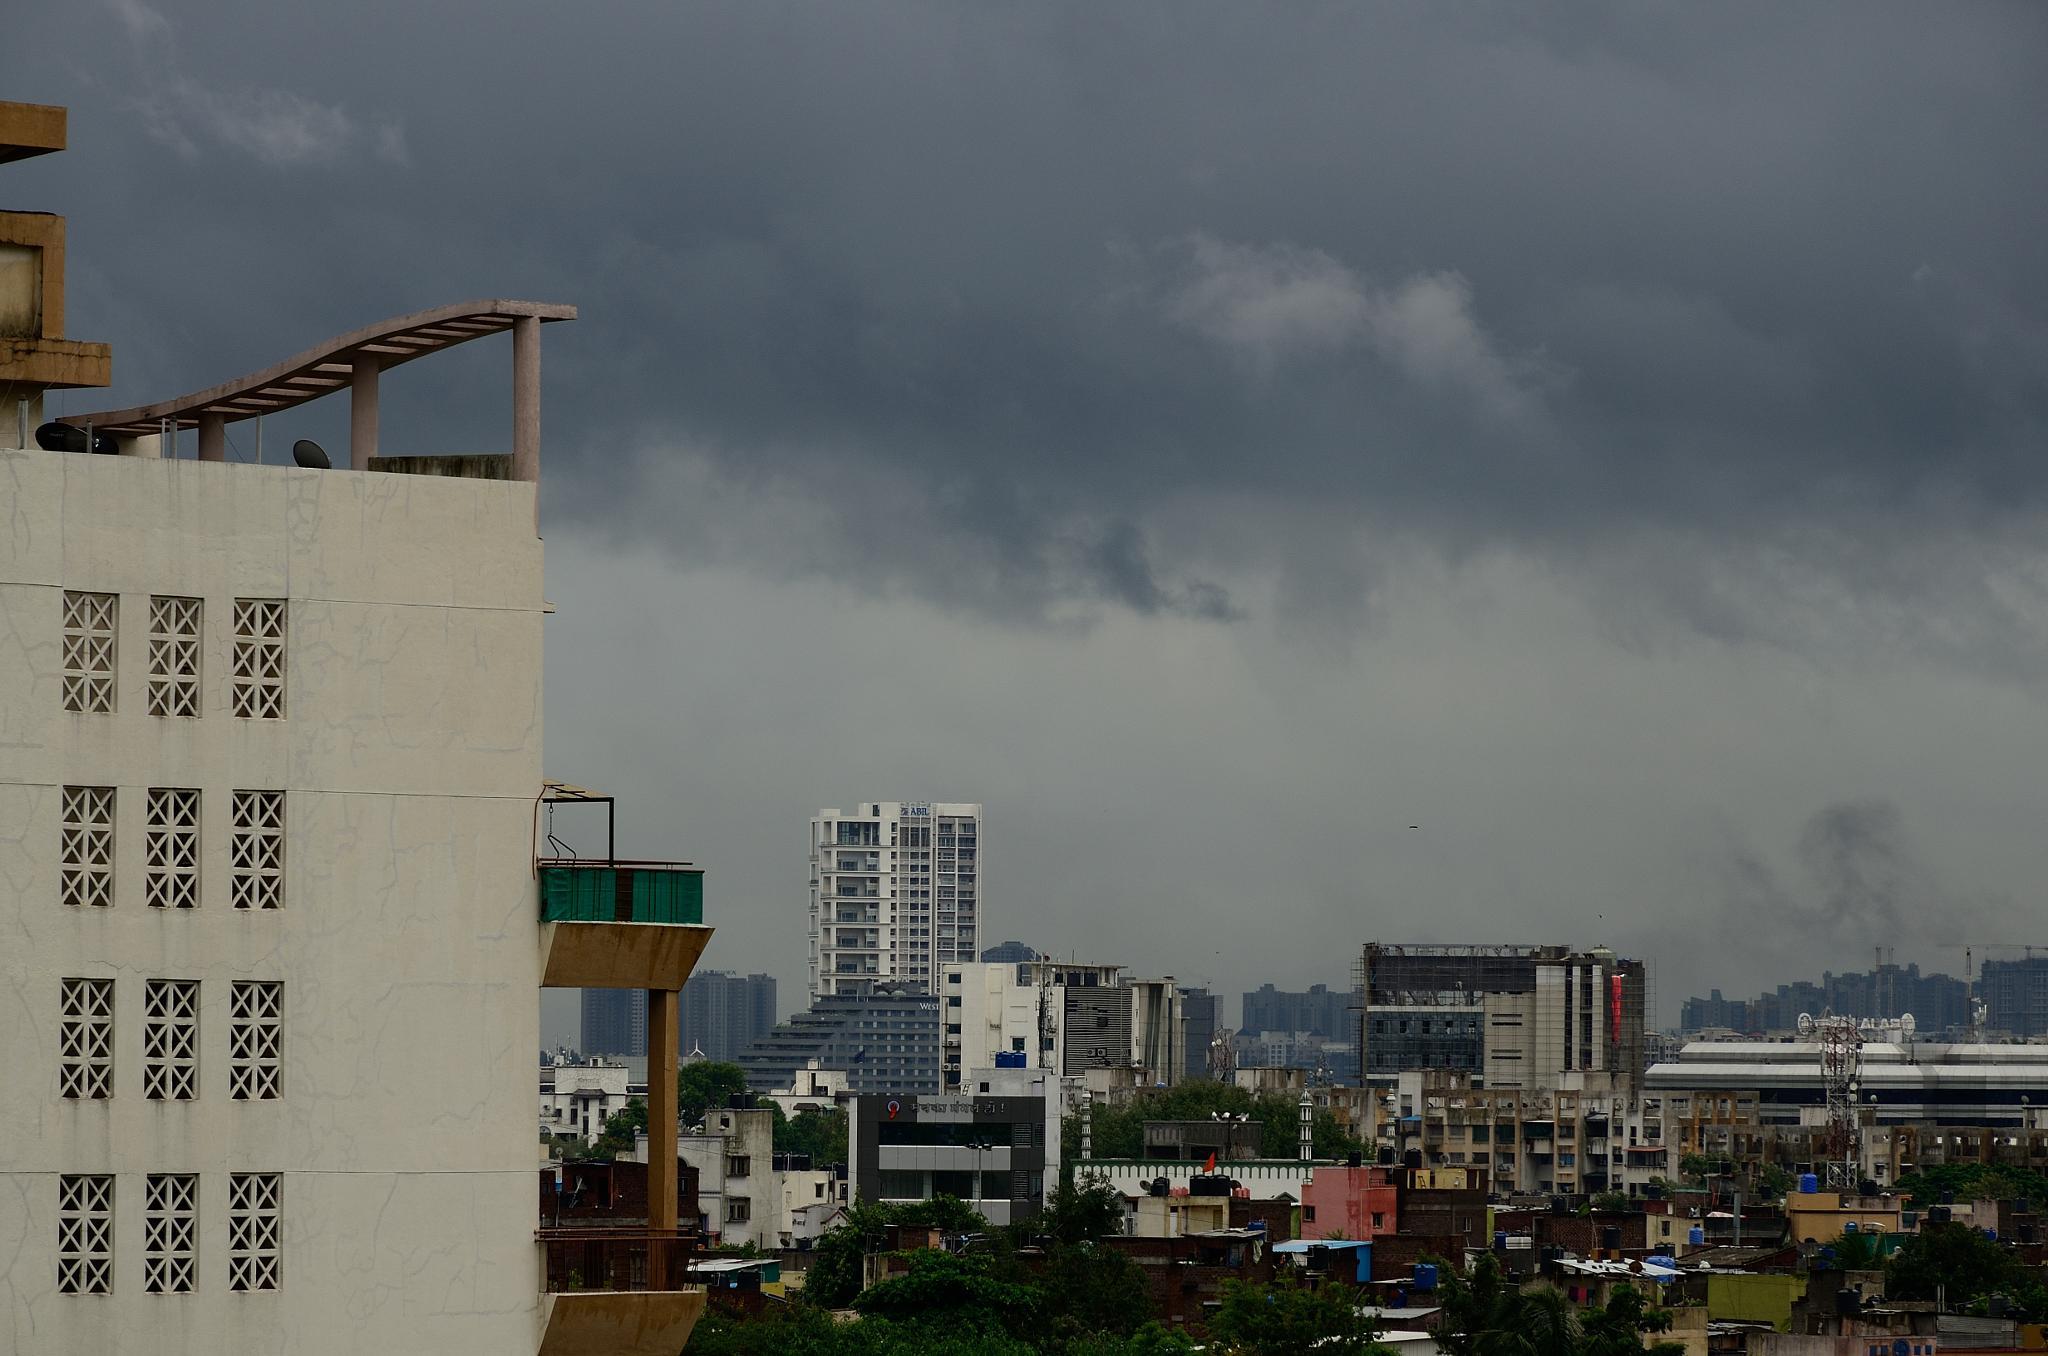 Dark cloud at dusk by Sridhar R Setty